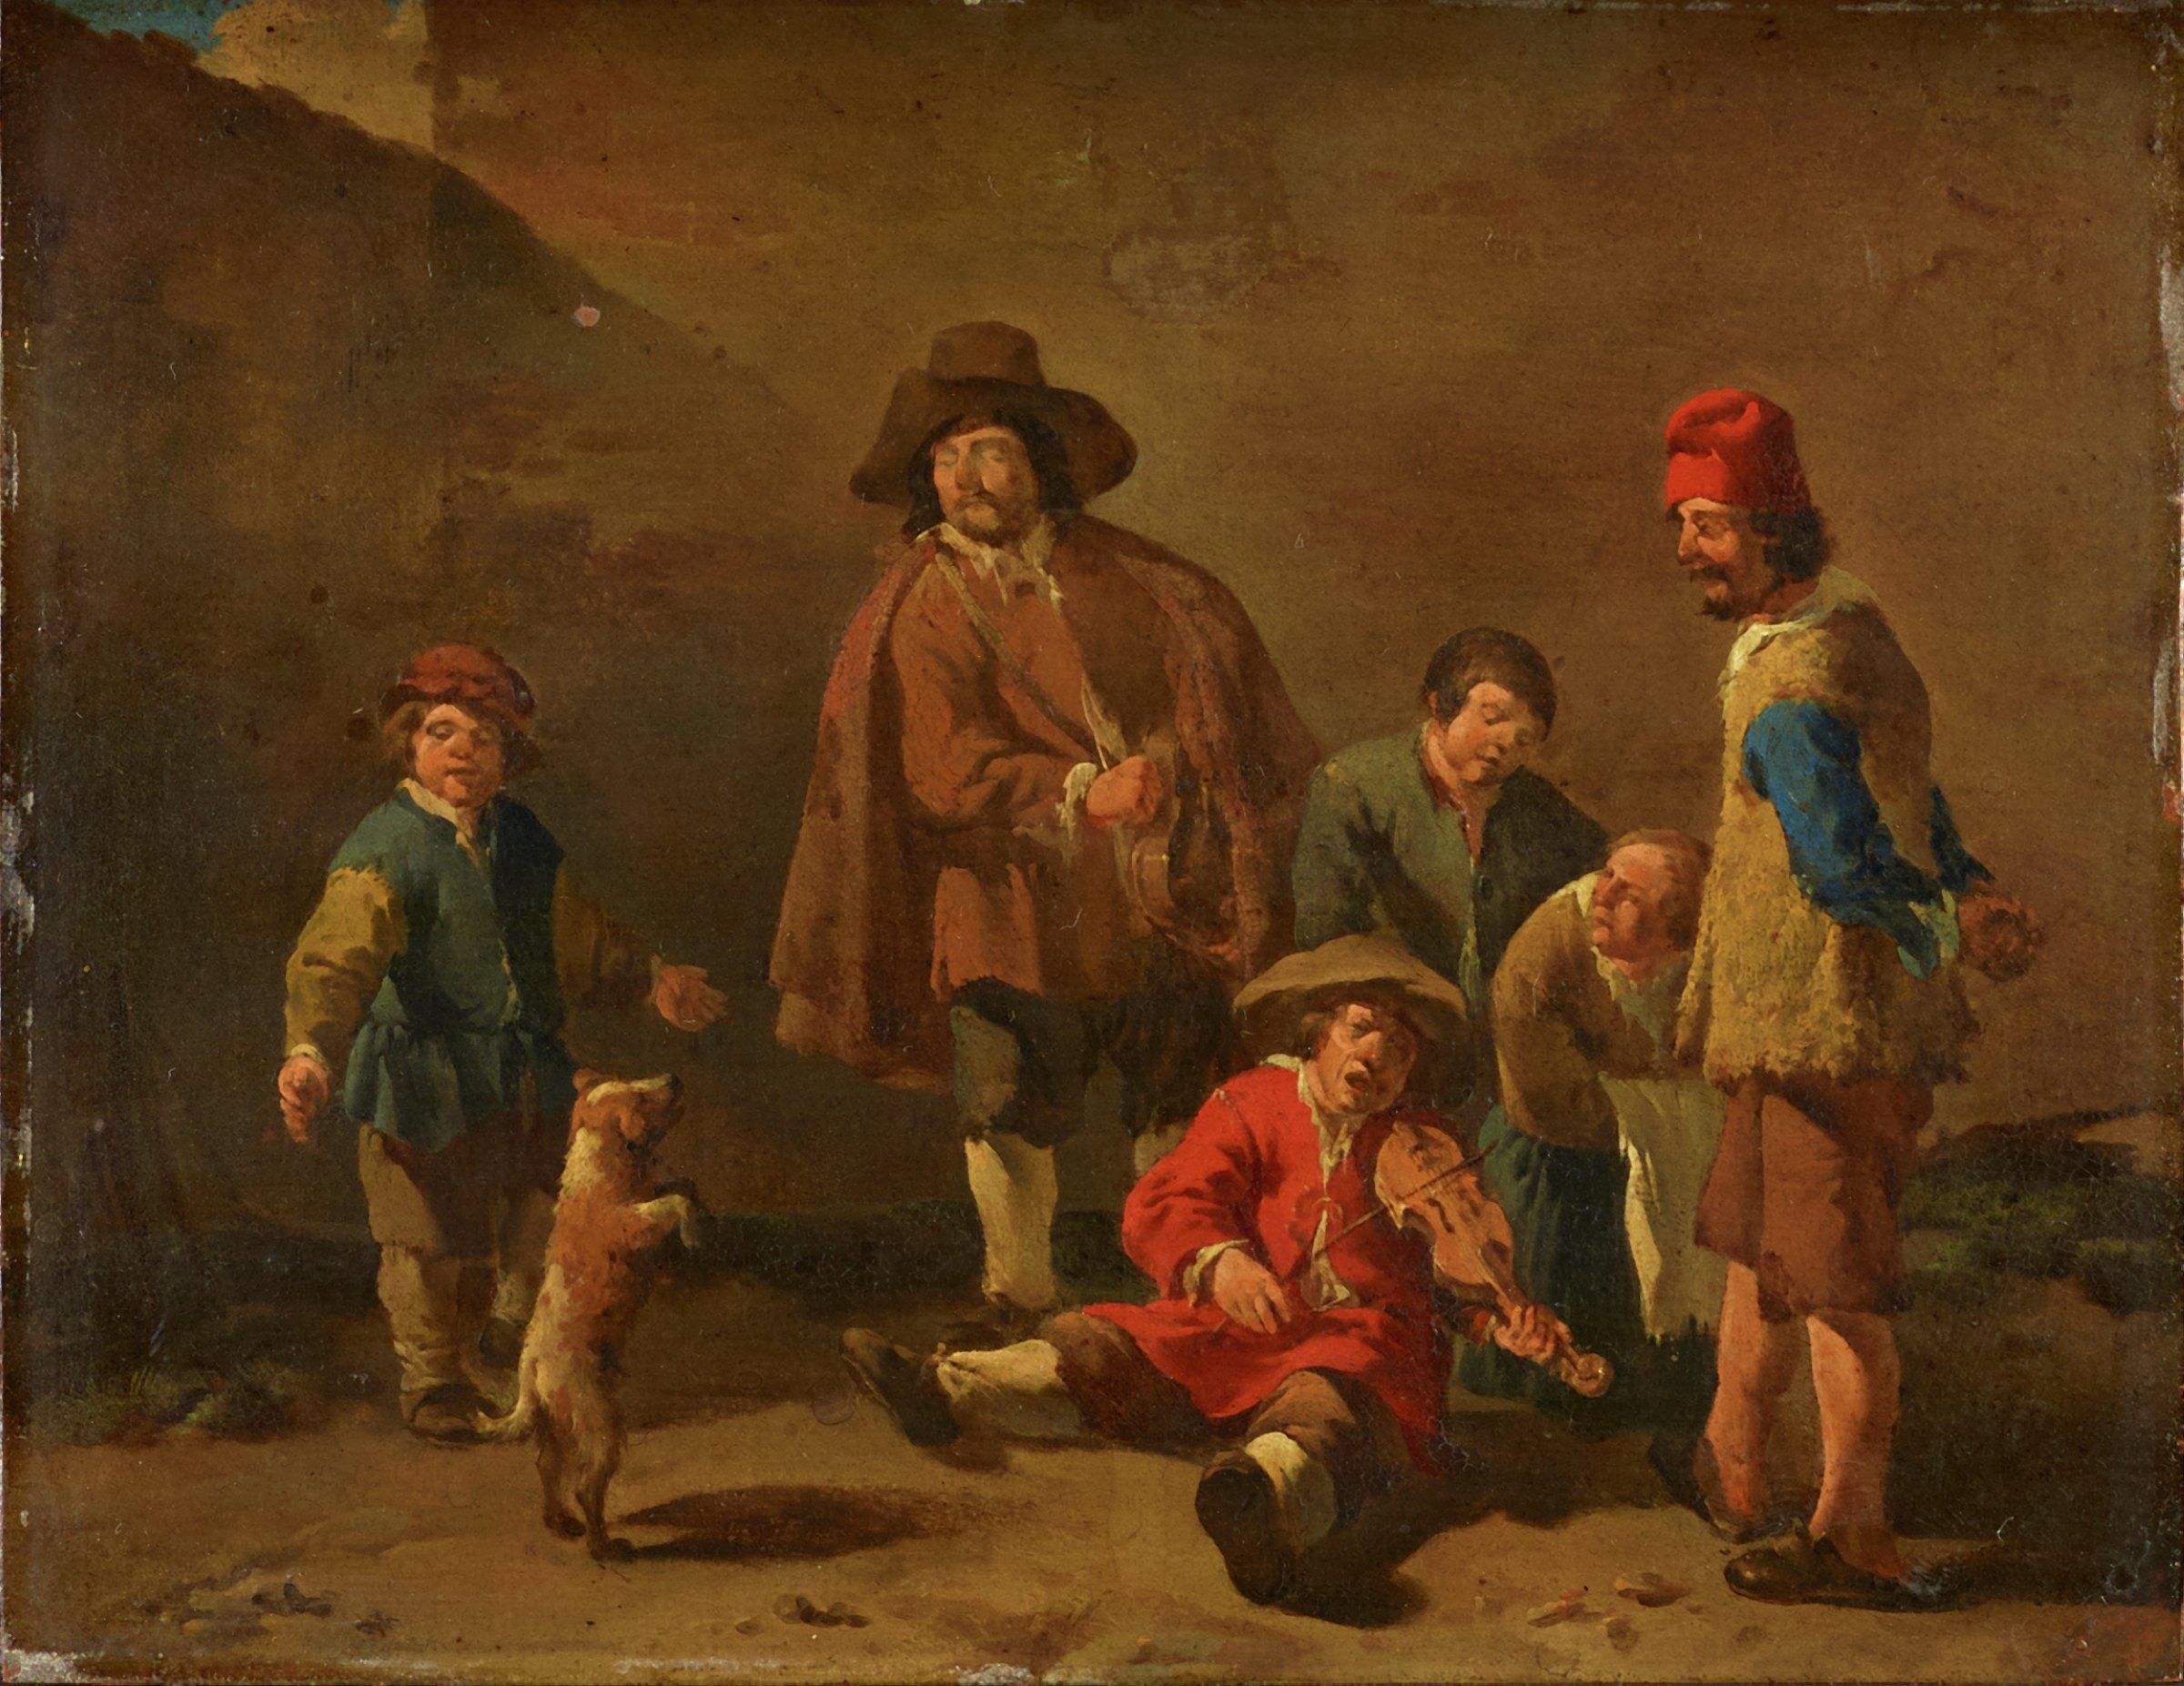 Italian Itinerant Musicians, Karel Dujardin, oil on copper